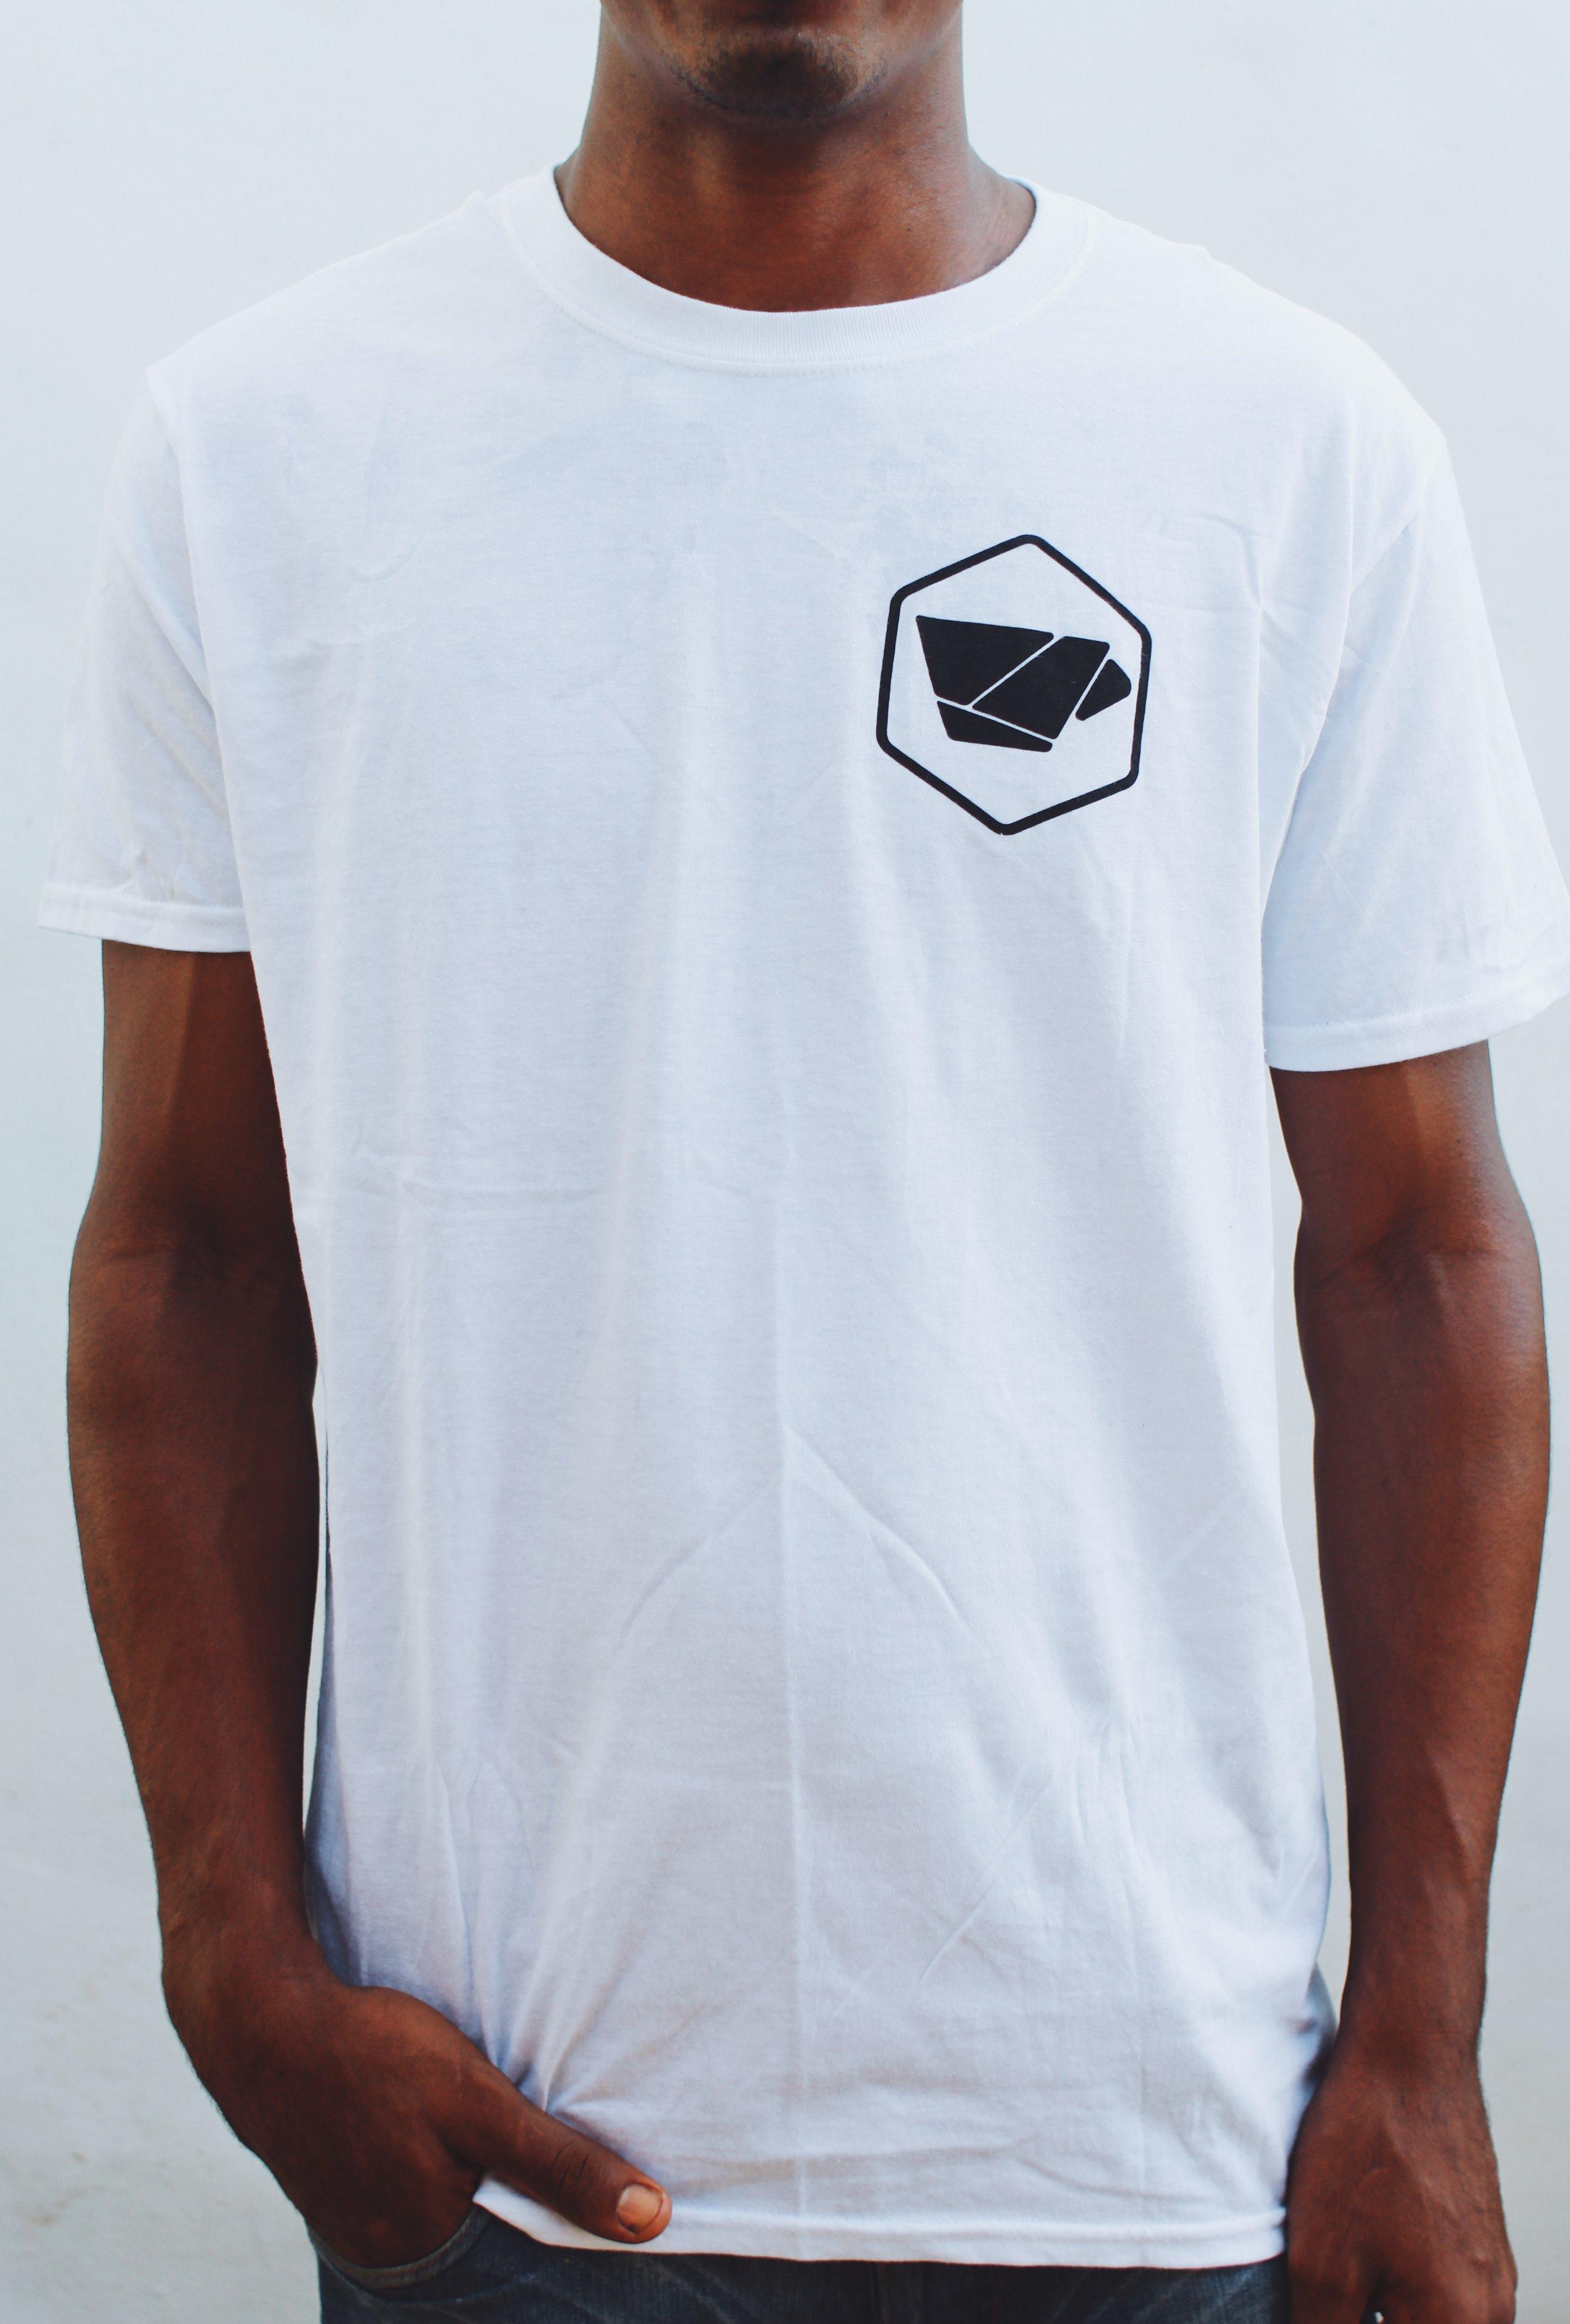 Vagamundo Shirt (White - ft. front side) *Size Large in photo $900rd / ~$20 usd